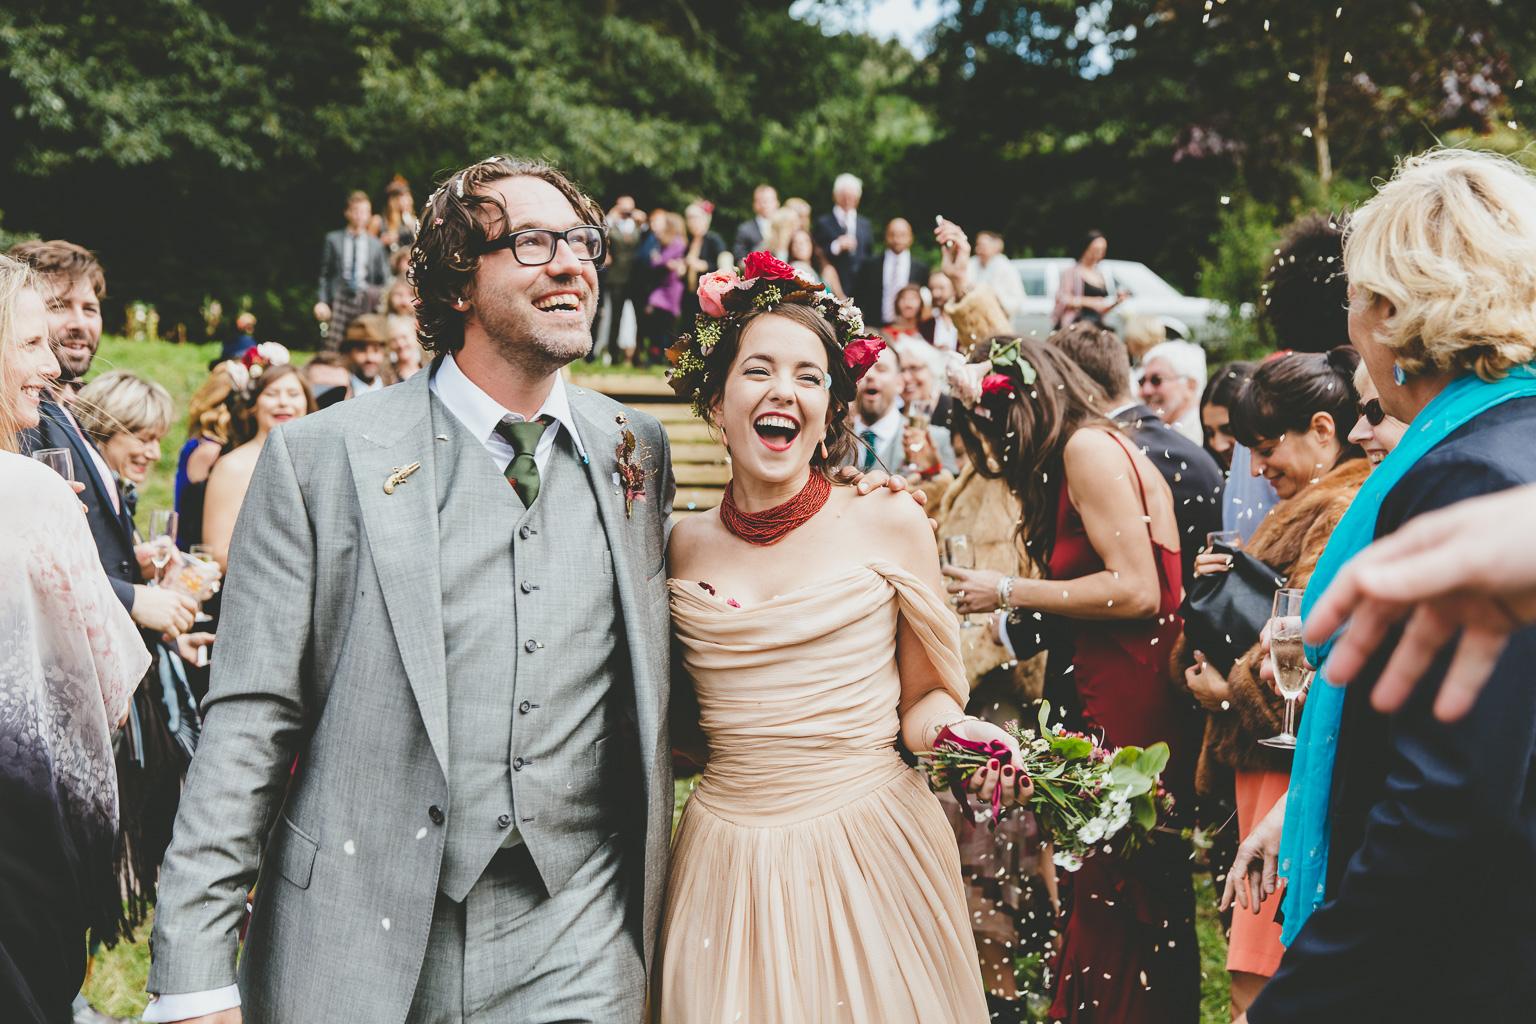 Festival-wedding-photography-00008